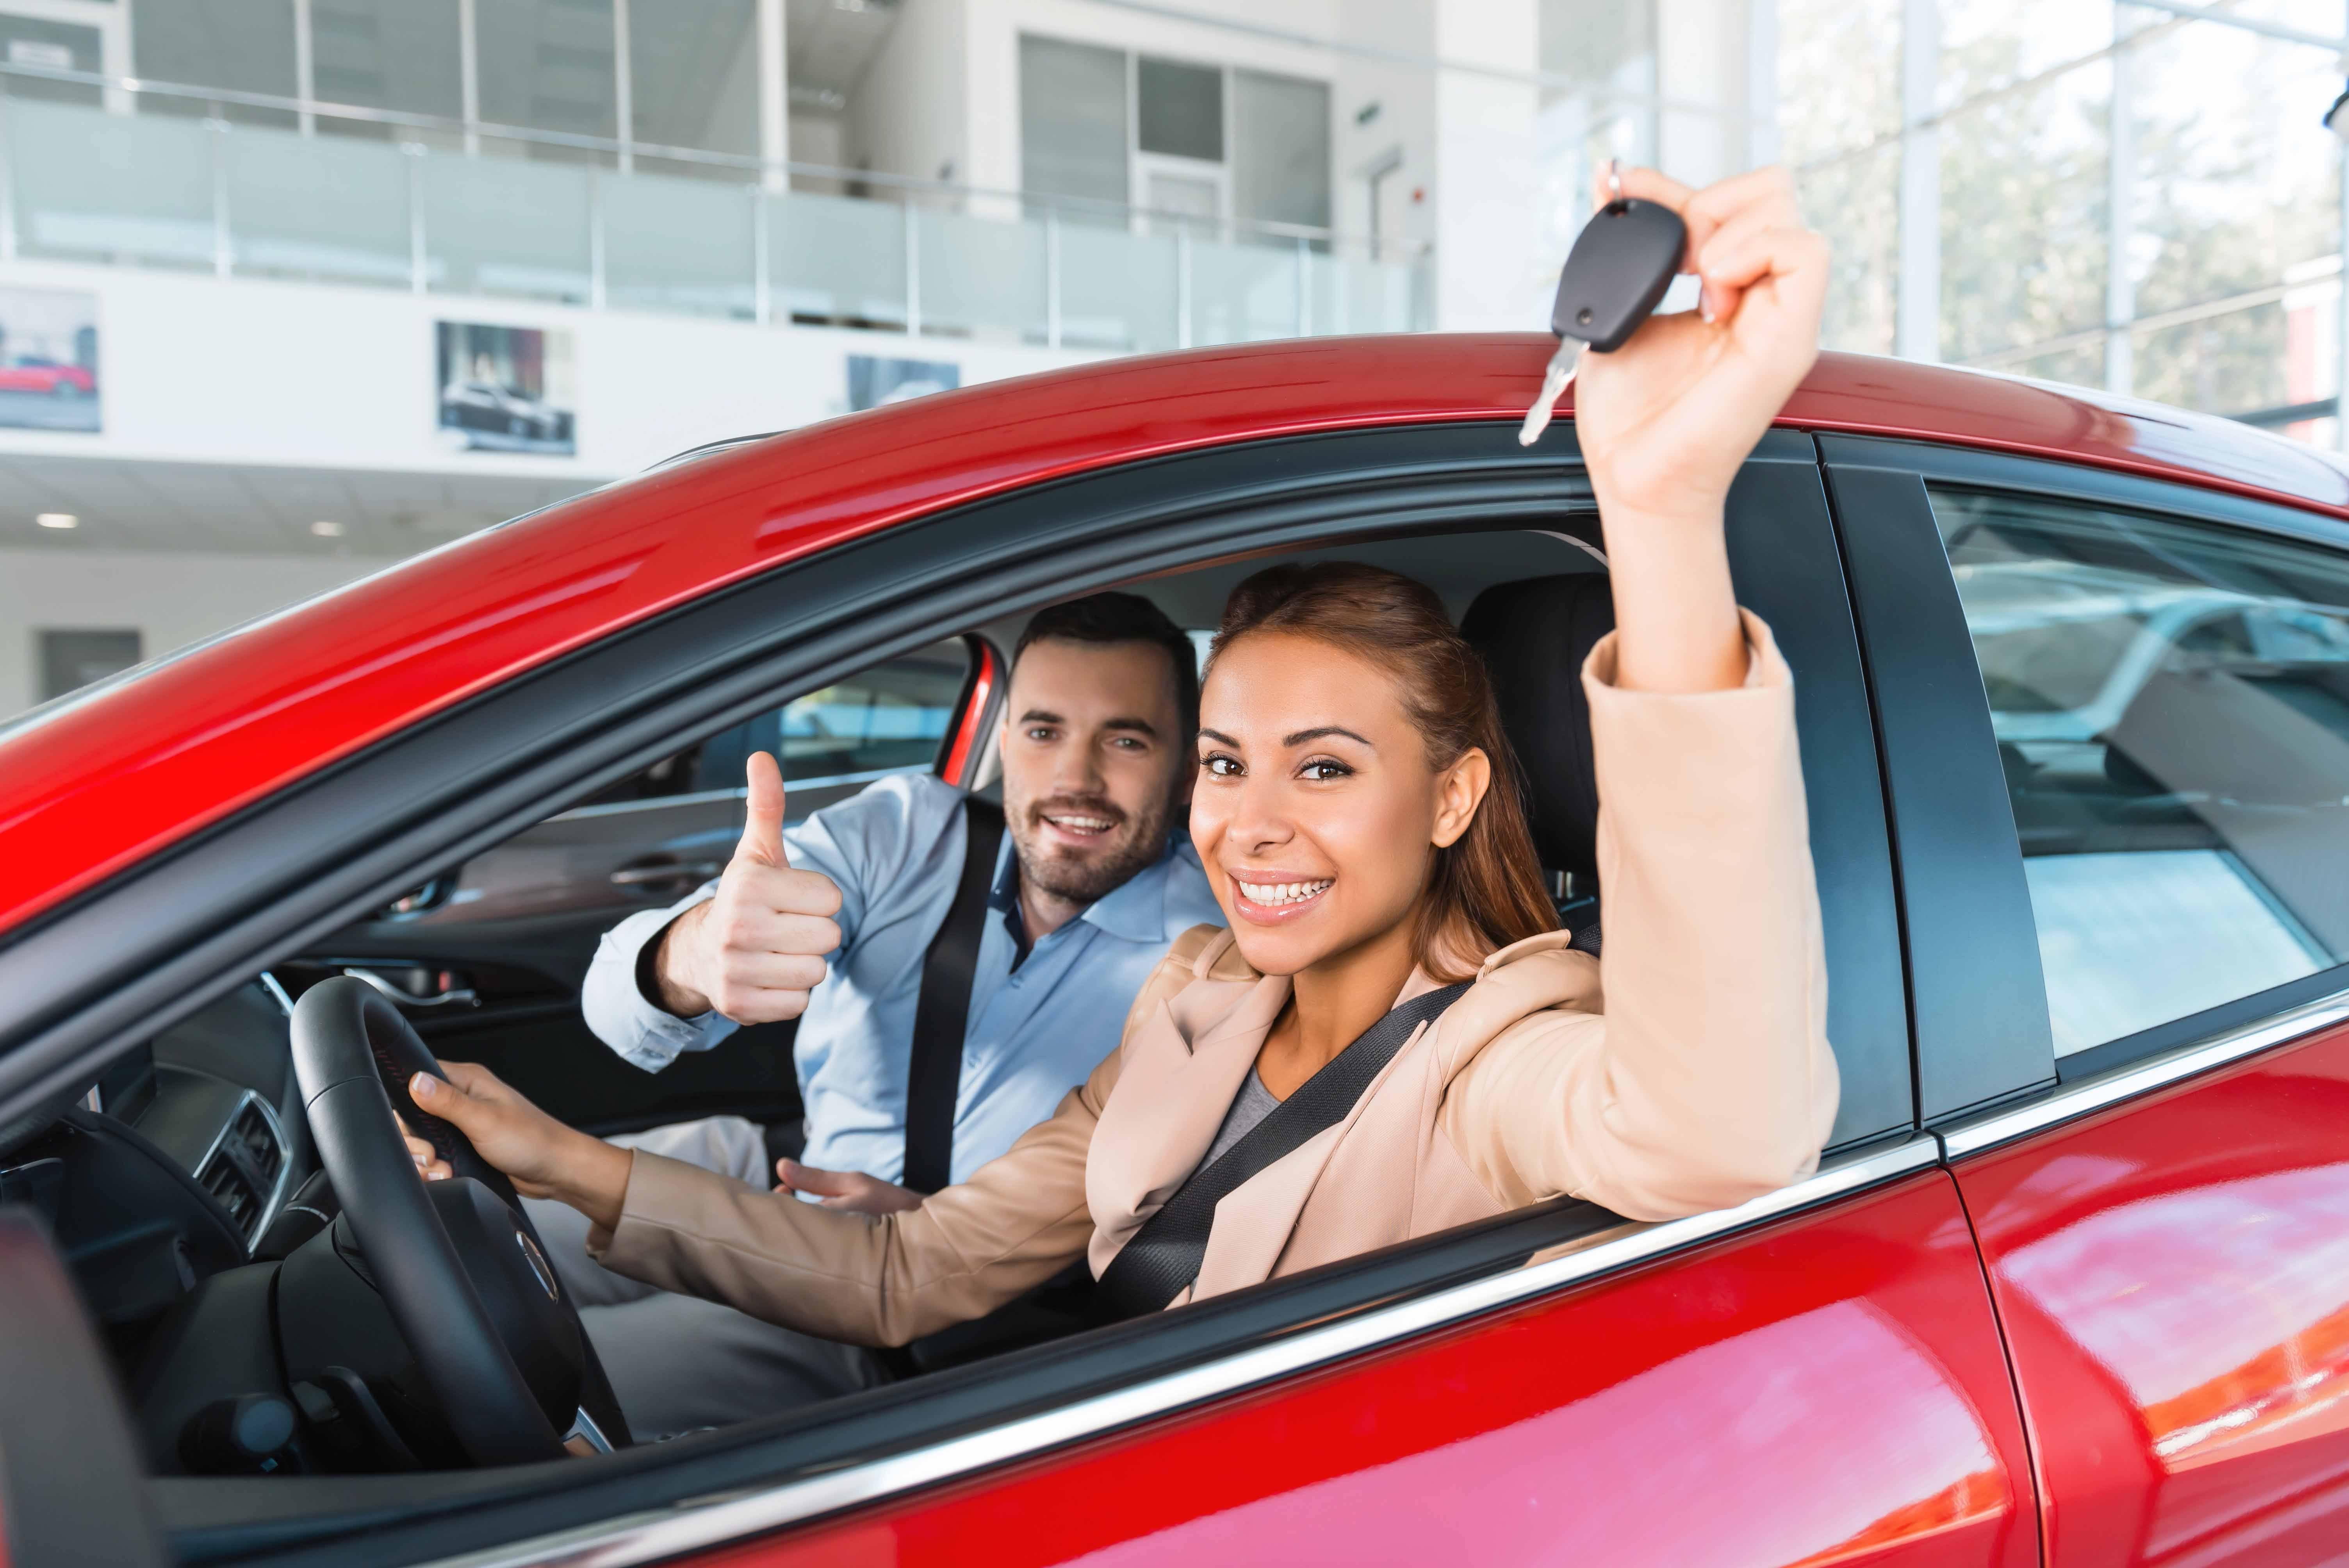 Аренда авто в европе, условия автопроката и советы туристам в германии